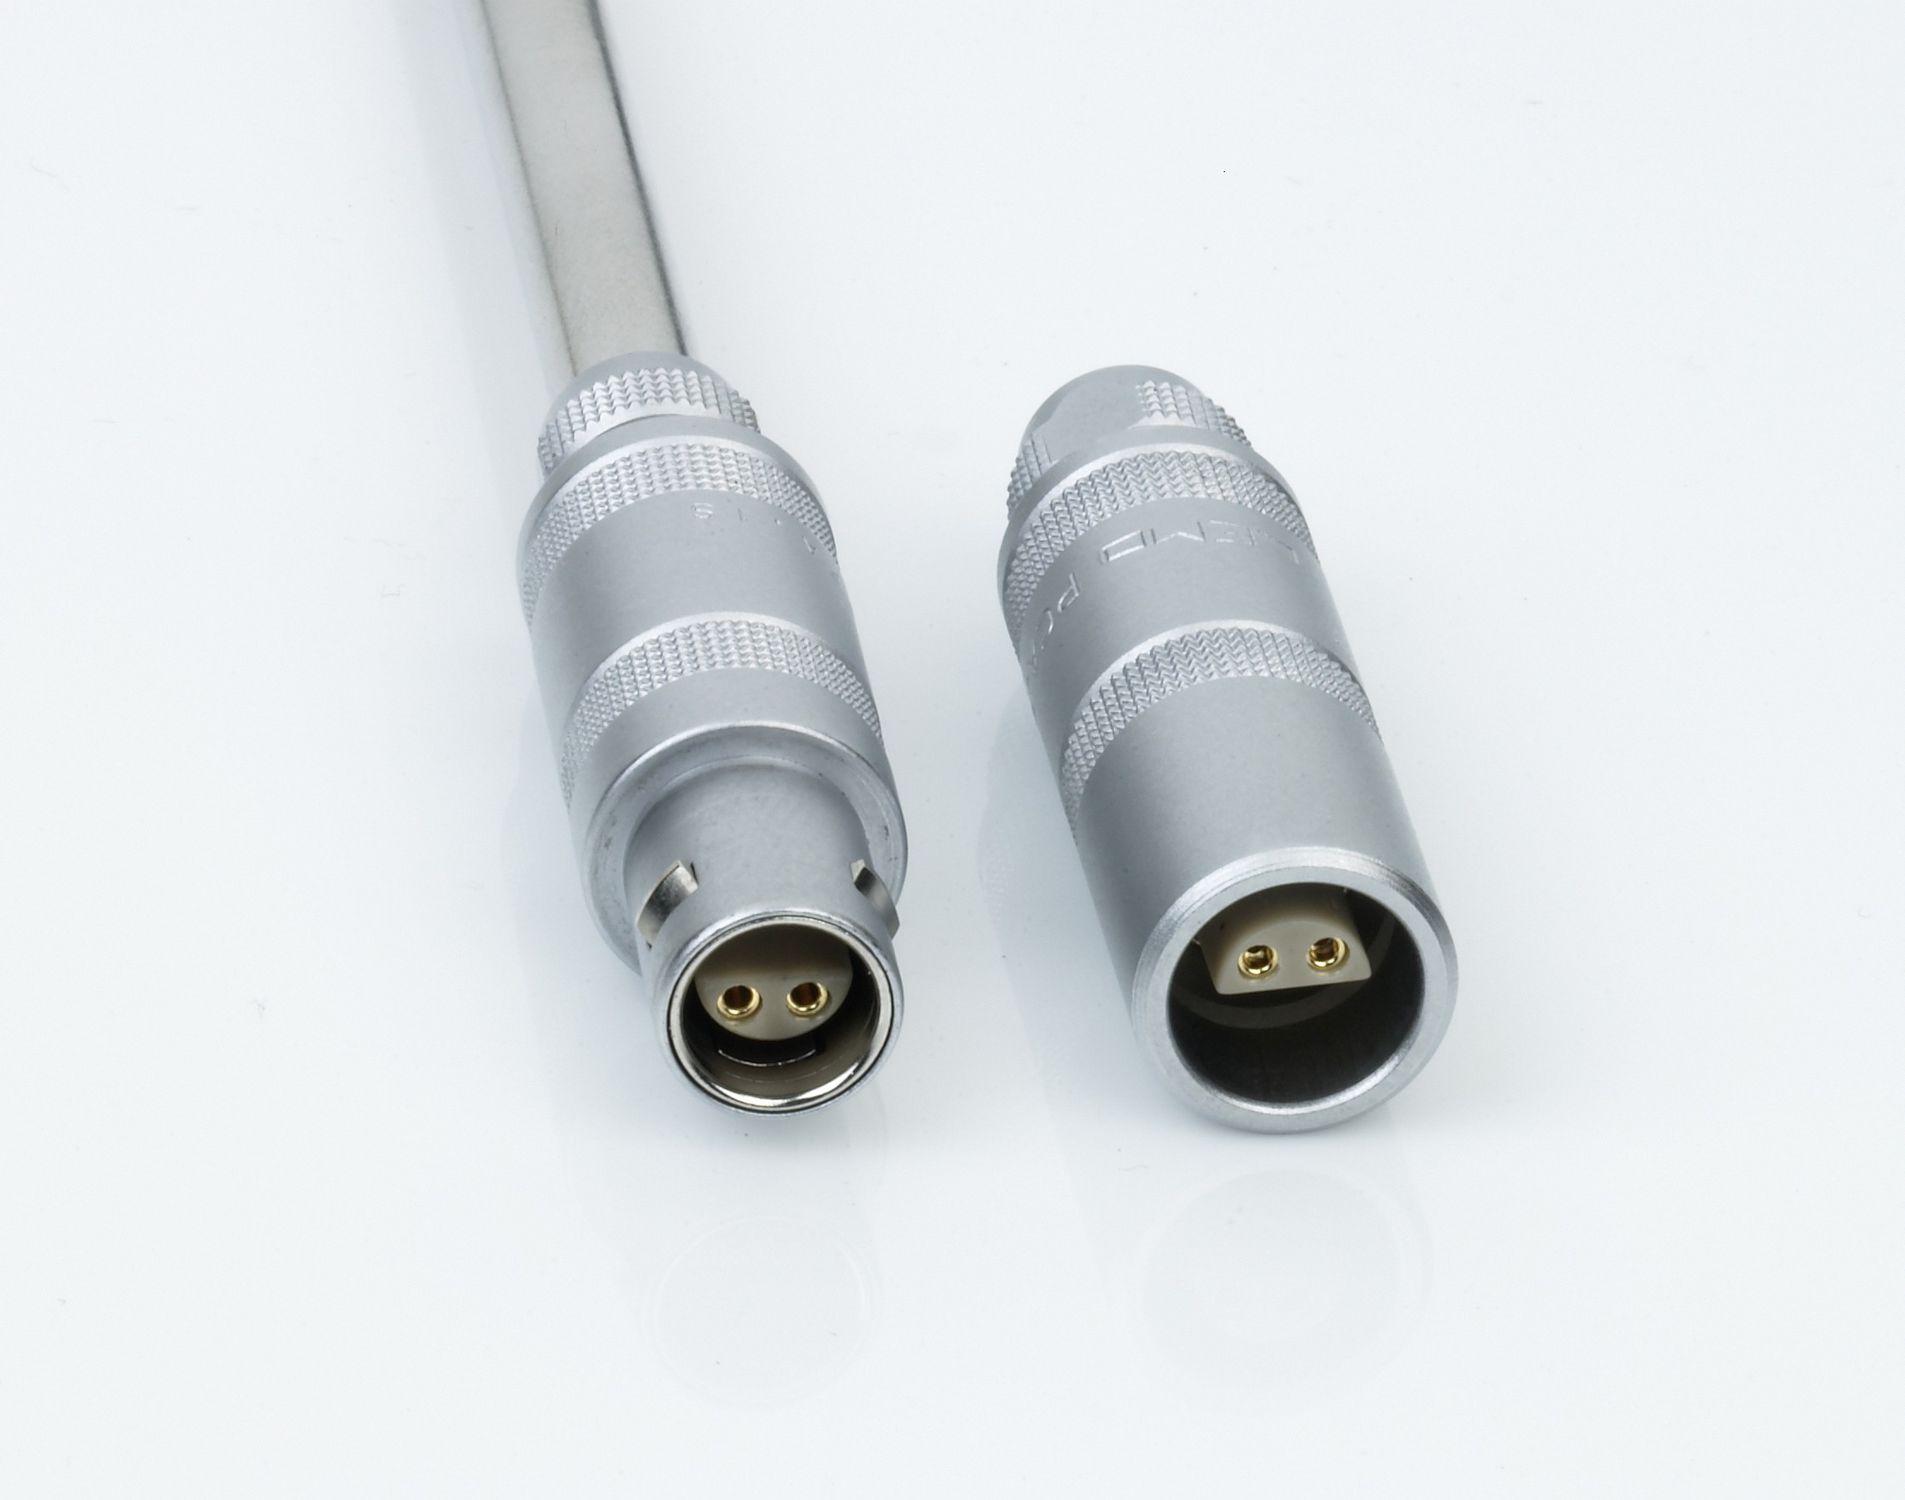 Pt100 temperature sensor / RTD / stainless steel / 4-wire - RGLEM ...